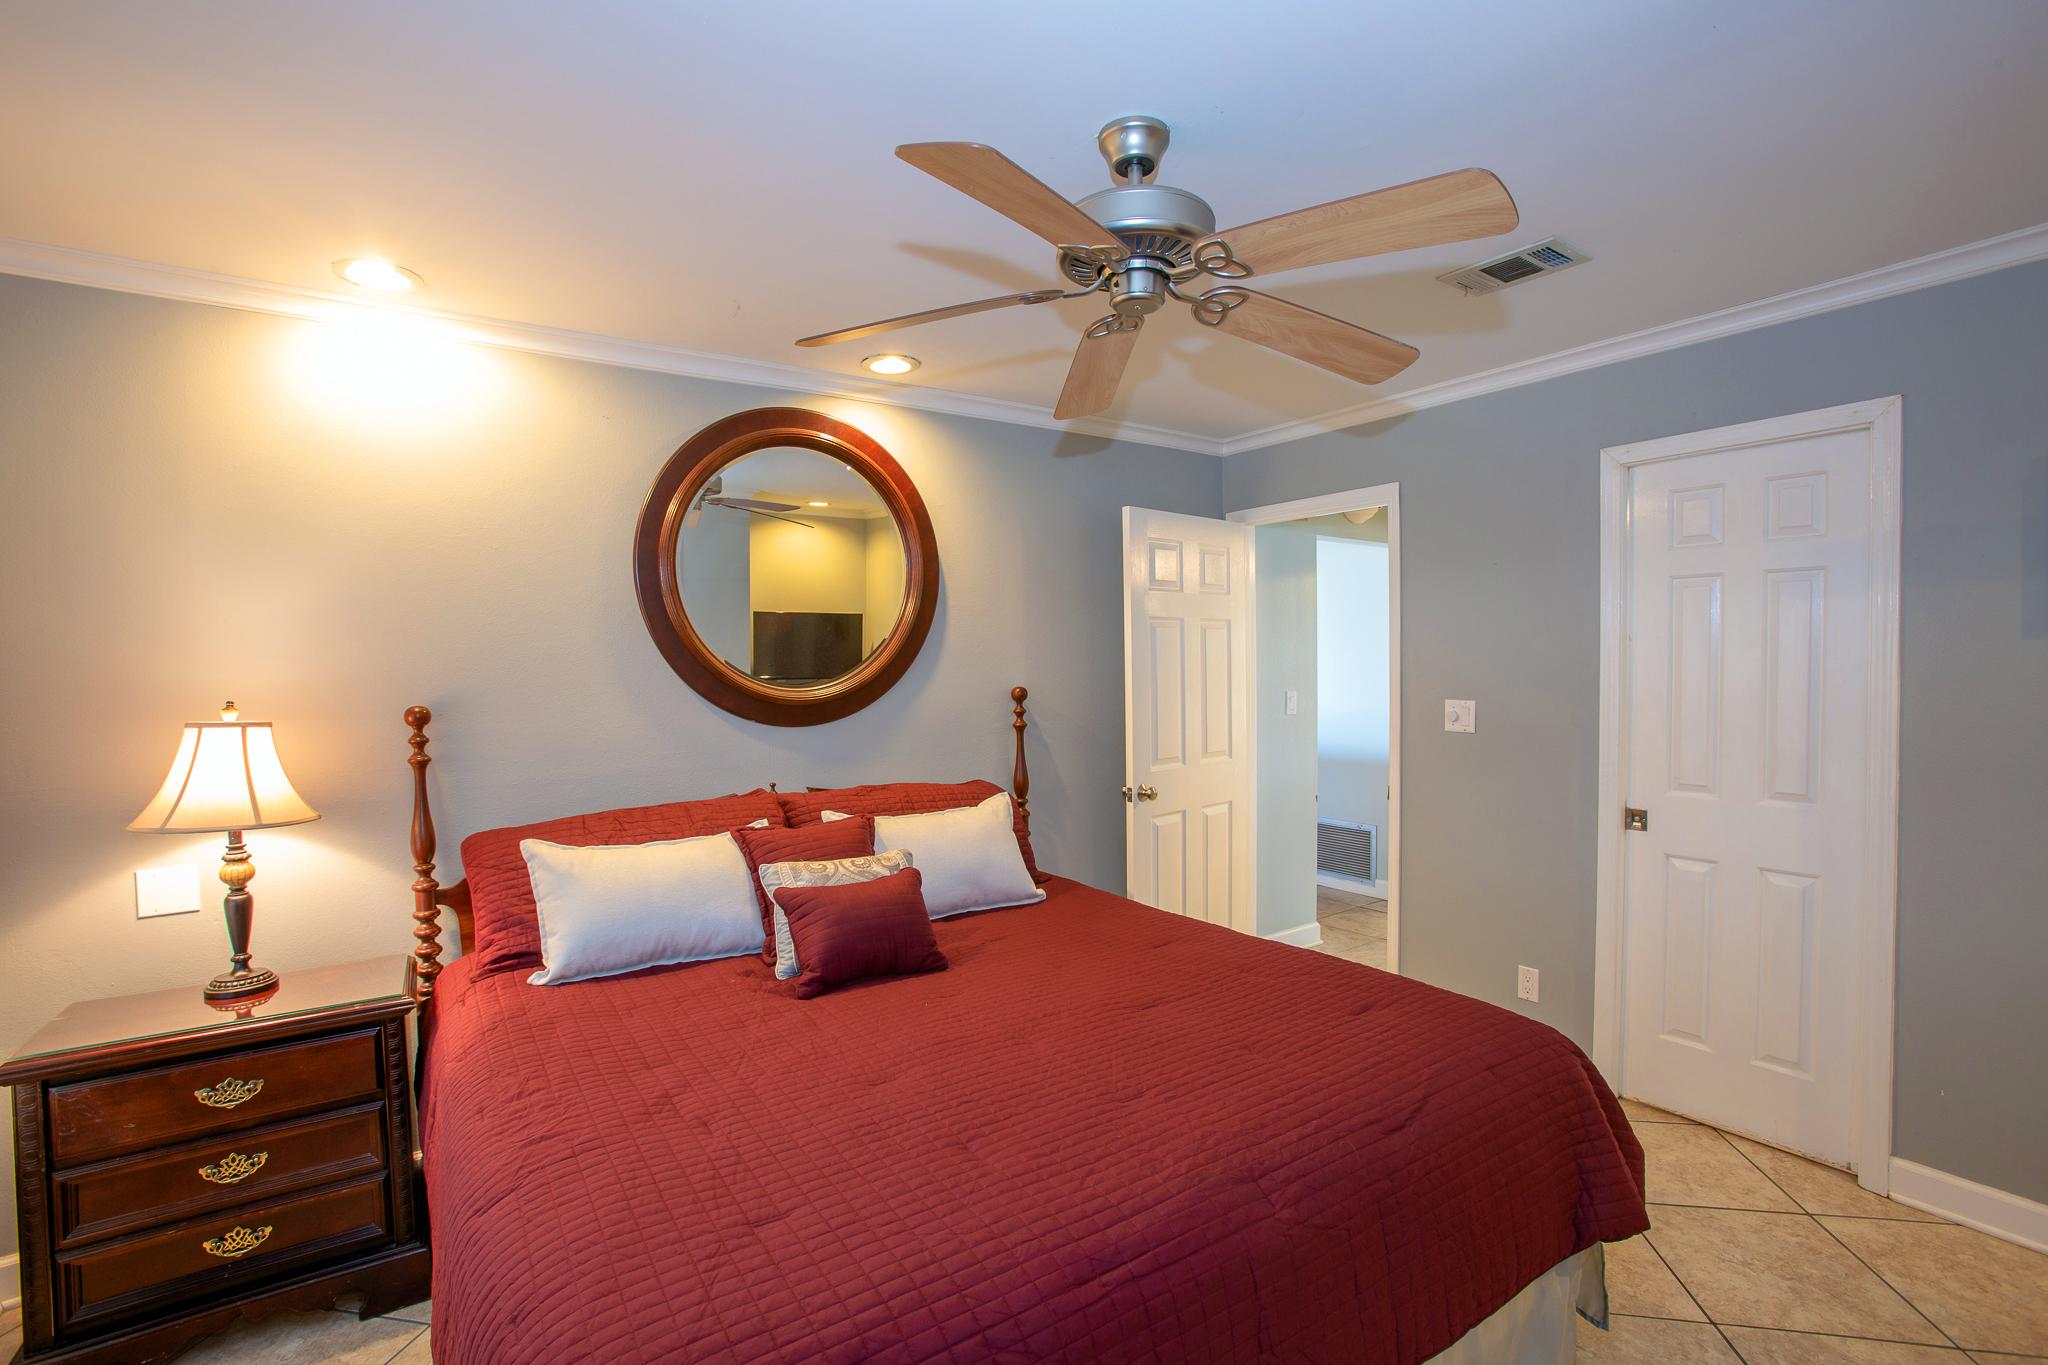 Maldonado 1015 - Sea the Big Picture House/Cottage rental in Pensacola Beach House Rentals in Pensacola Beach Florida - #12